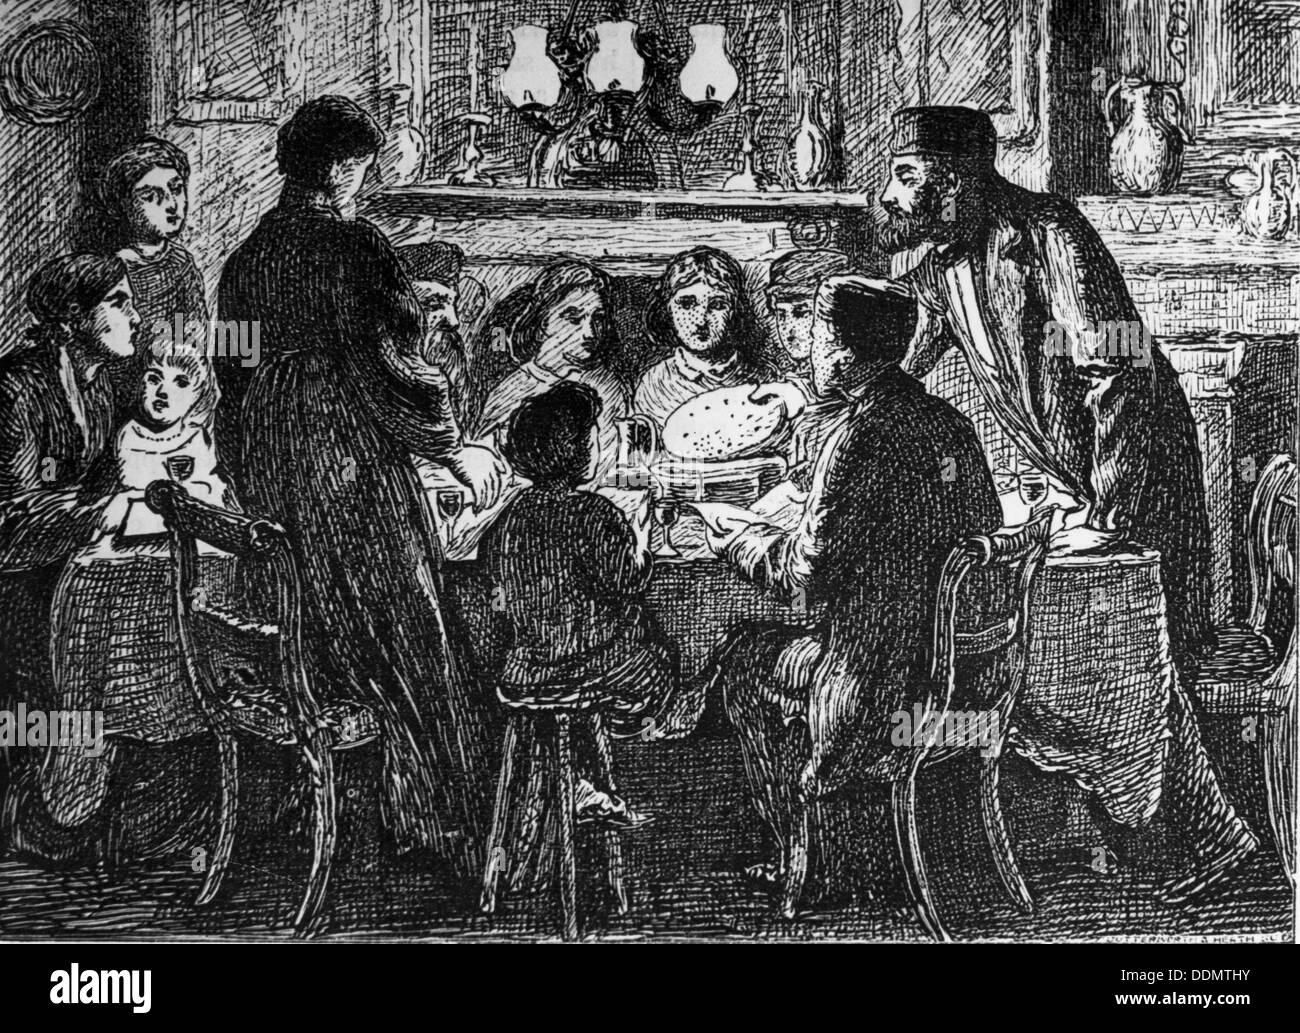 Seder meal, Passover, mid-late 19th century. Artist: Simeon Solomon - Stock Image